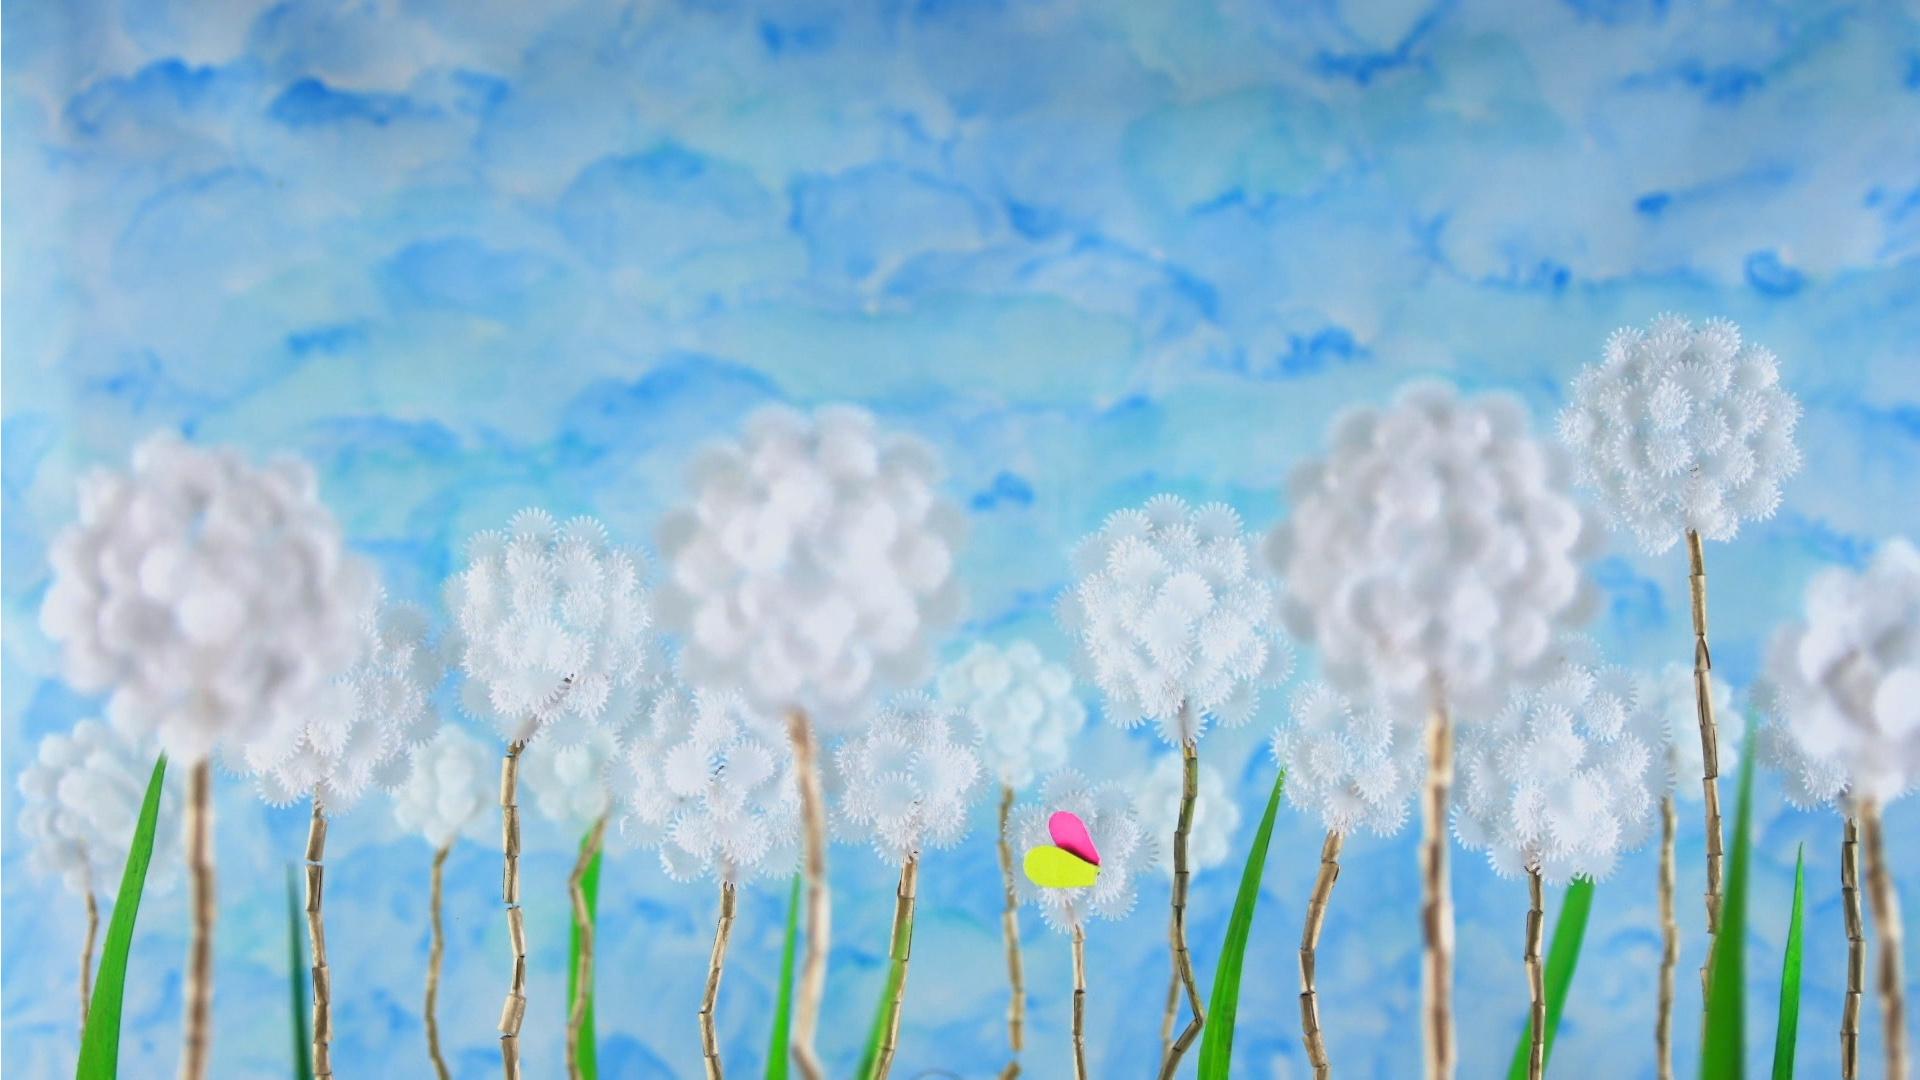 jardin movil, poster, miniseries, animation, films for babies, preschool, stop motion, shortsfit